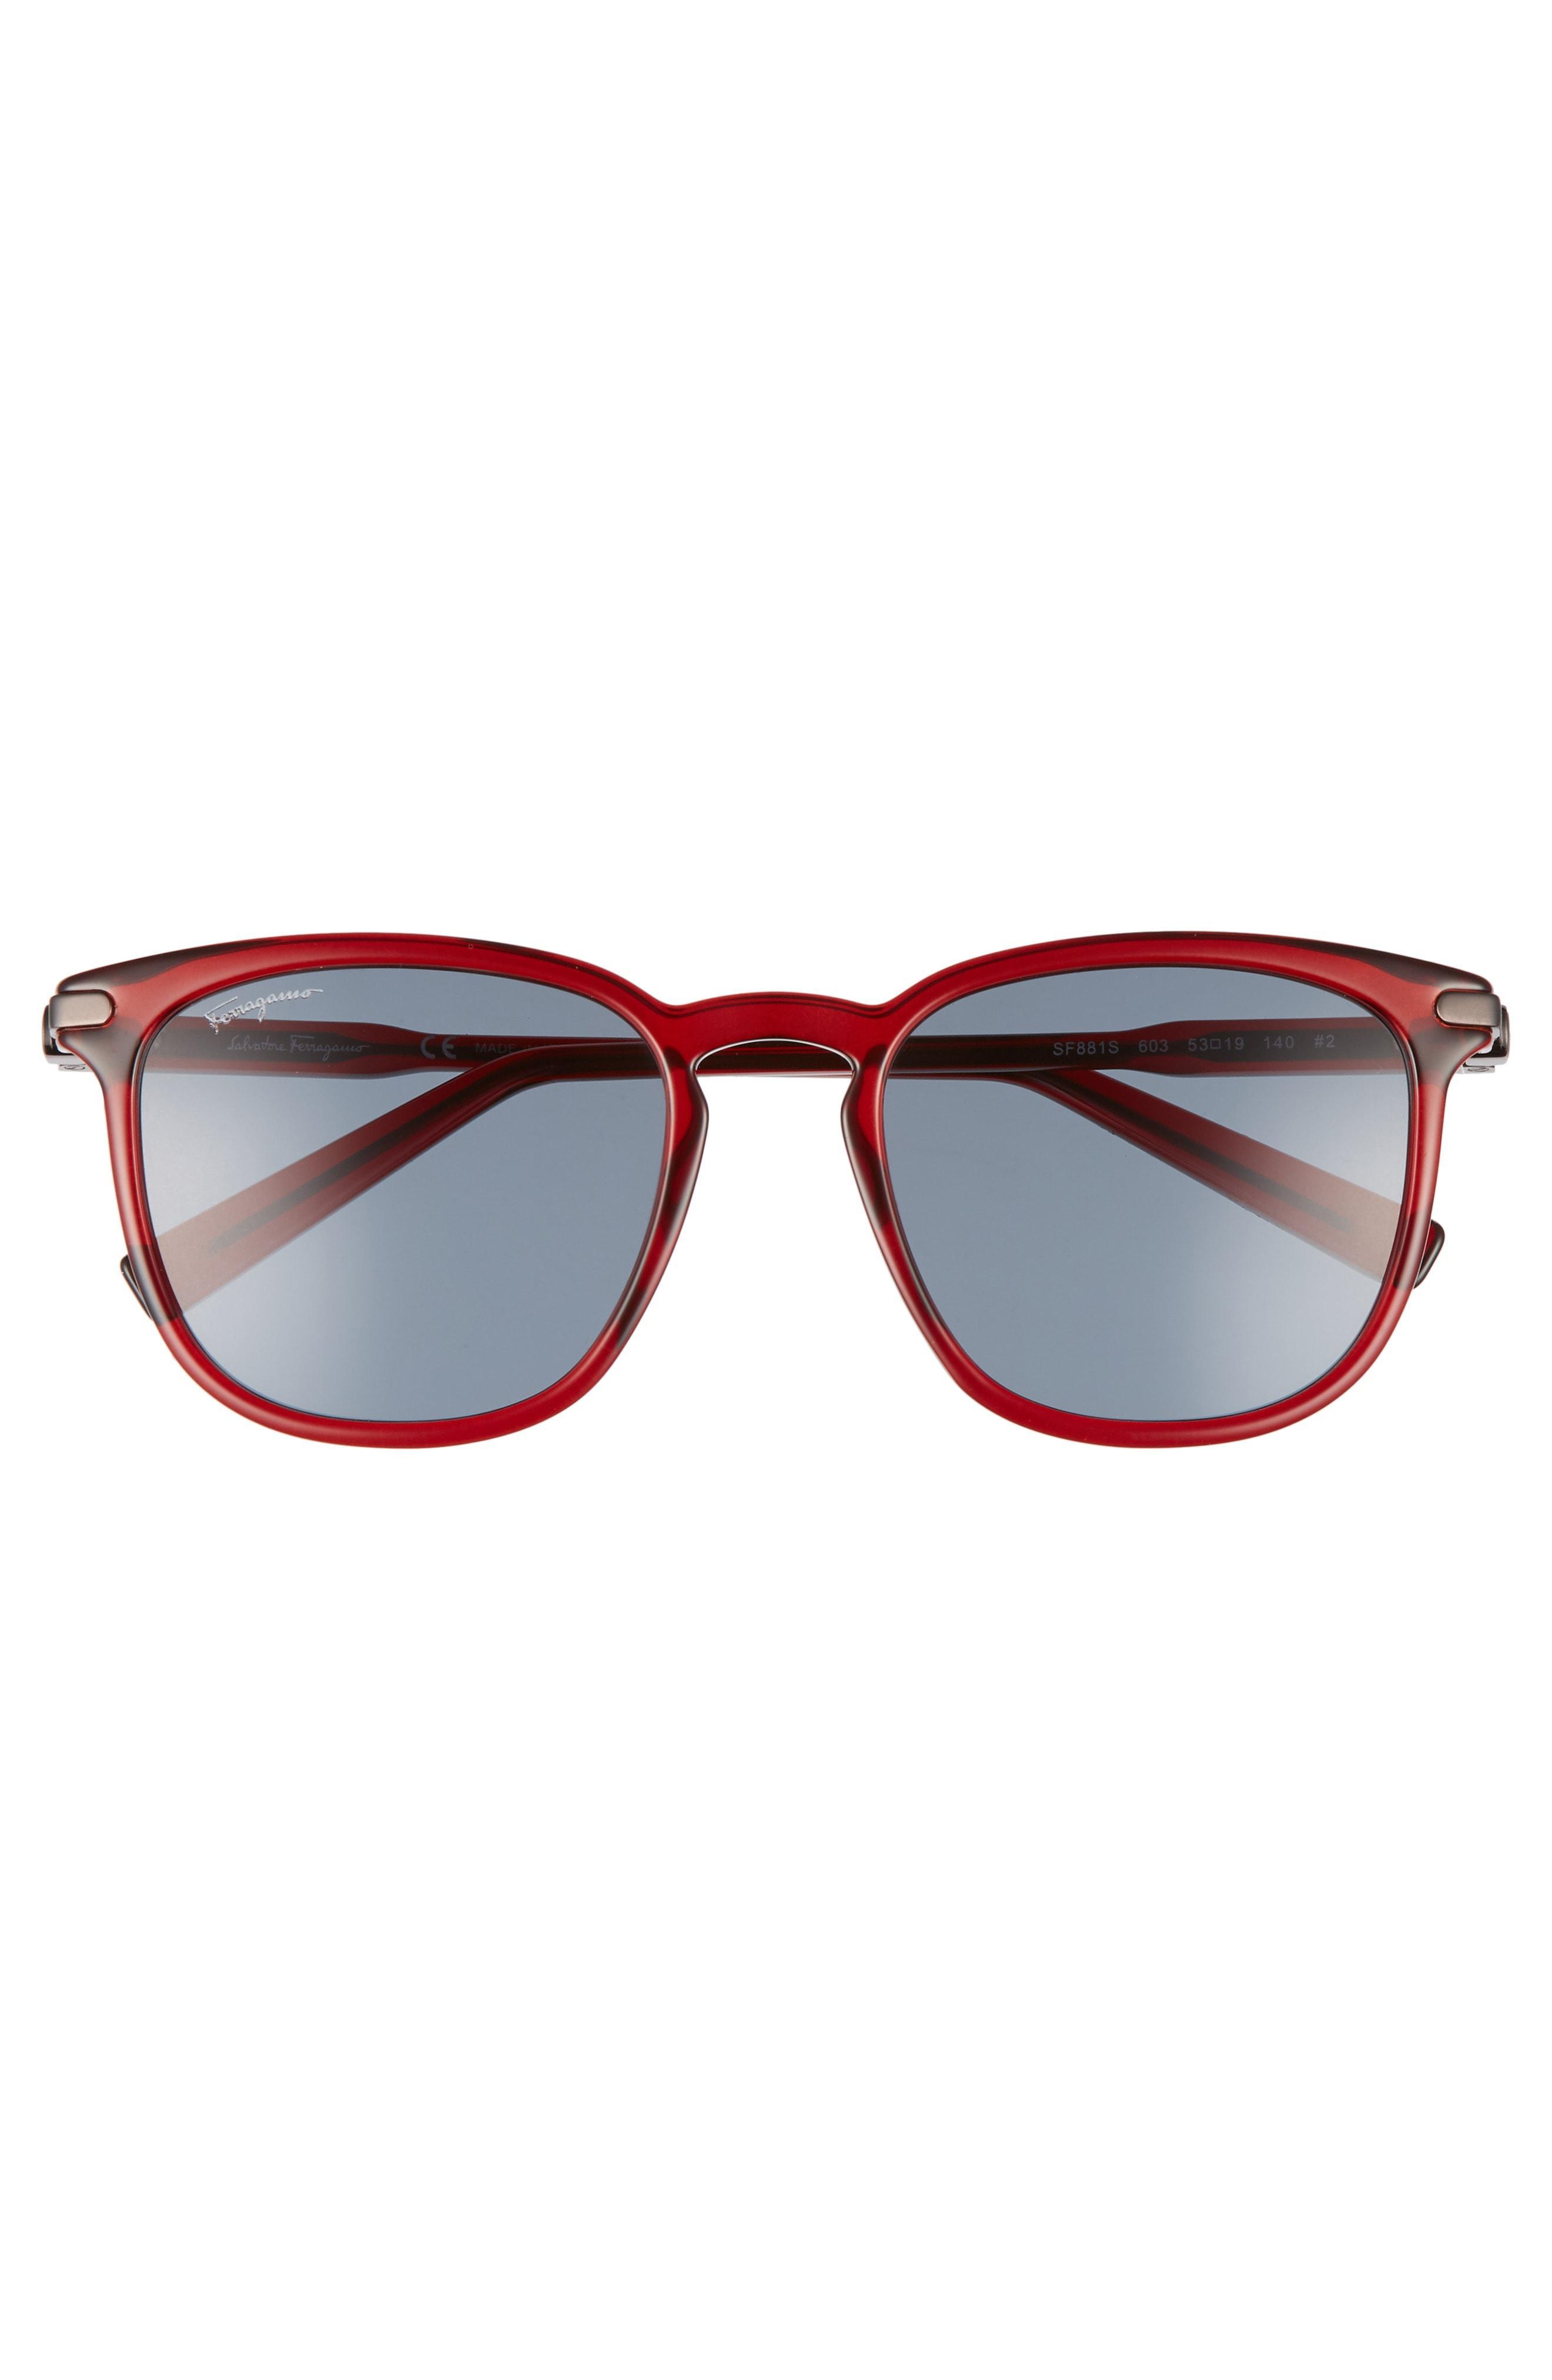 262bb42738d Salvatore Ferragamo Double Gancio 53Mm Sunglasses - Bordeaux